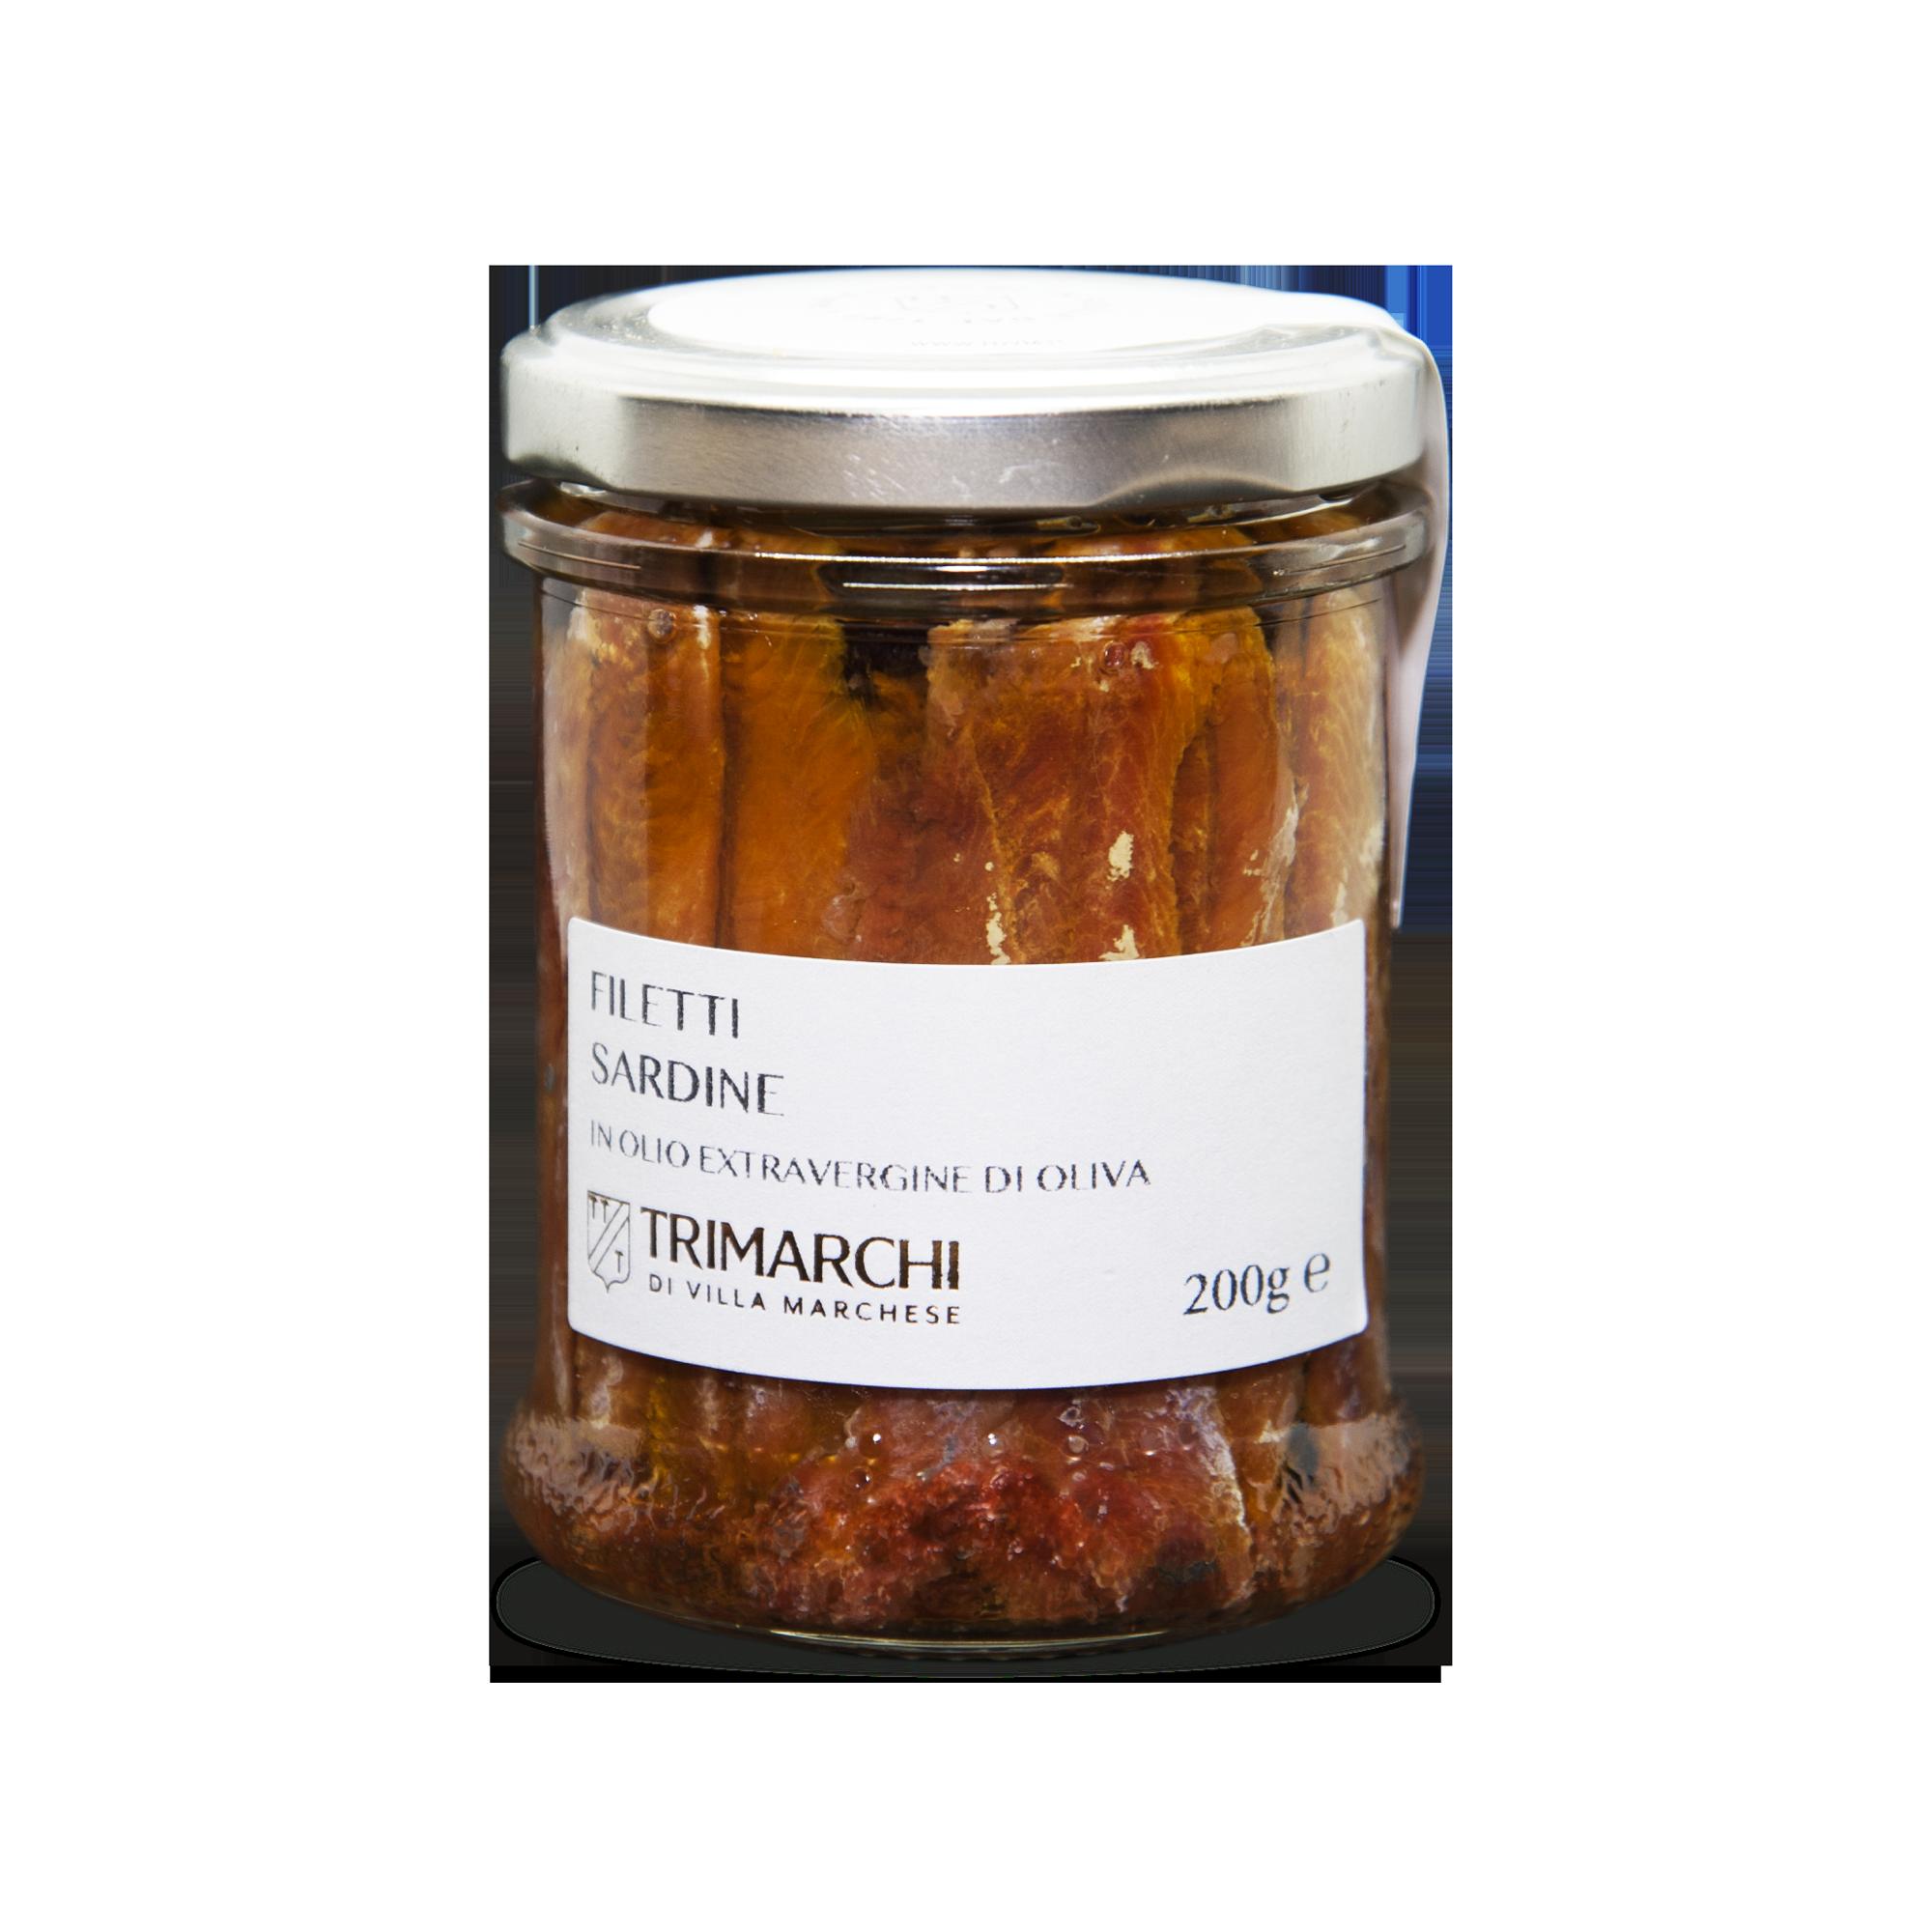 Filetti di Sardine in olio extravergine di oliva